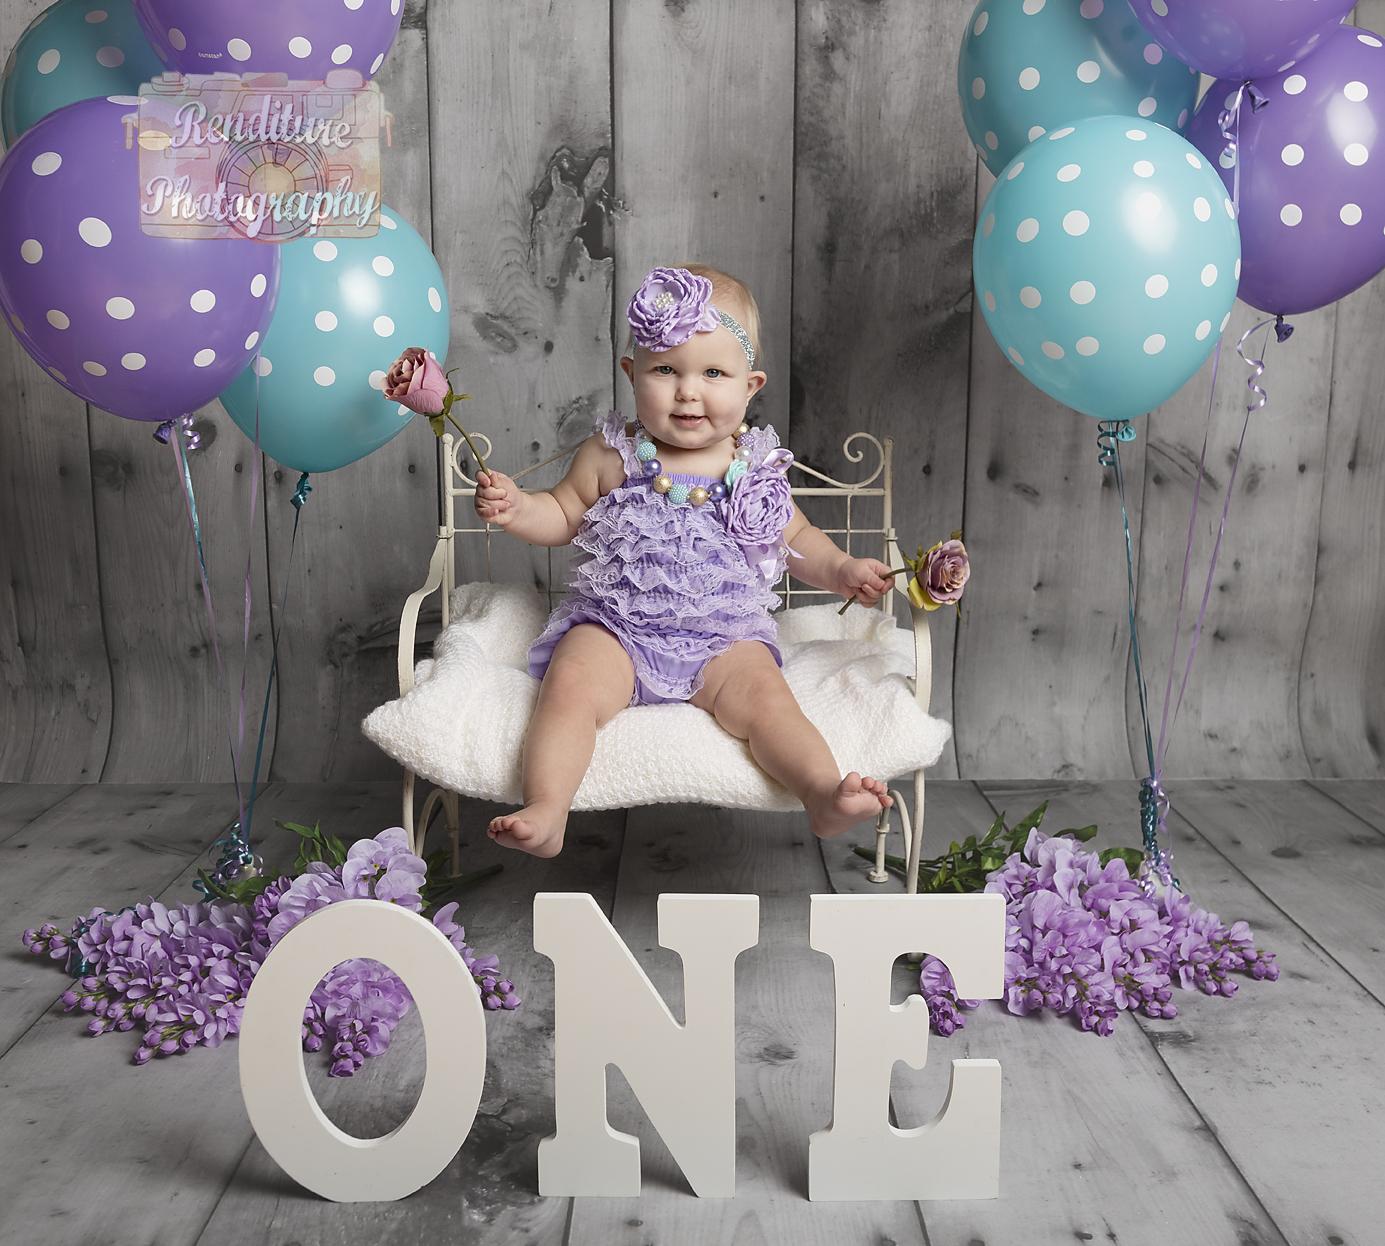 Saskatoon-Newborn-Family-Renditure-Mini-Session-Photography-Photographer-Maternity-Pregnancy-Saskatchewan-504FBR.jpg